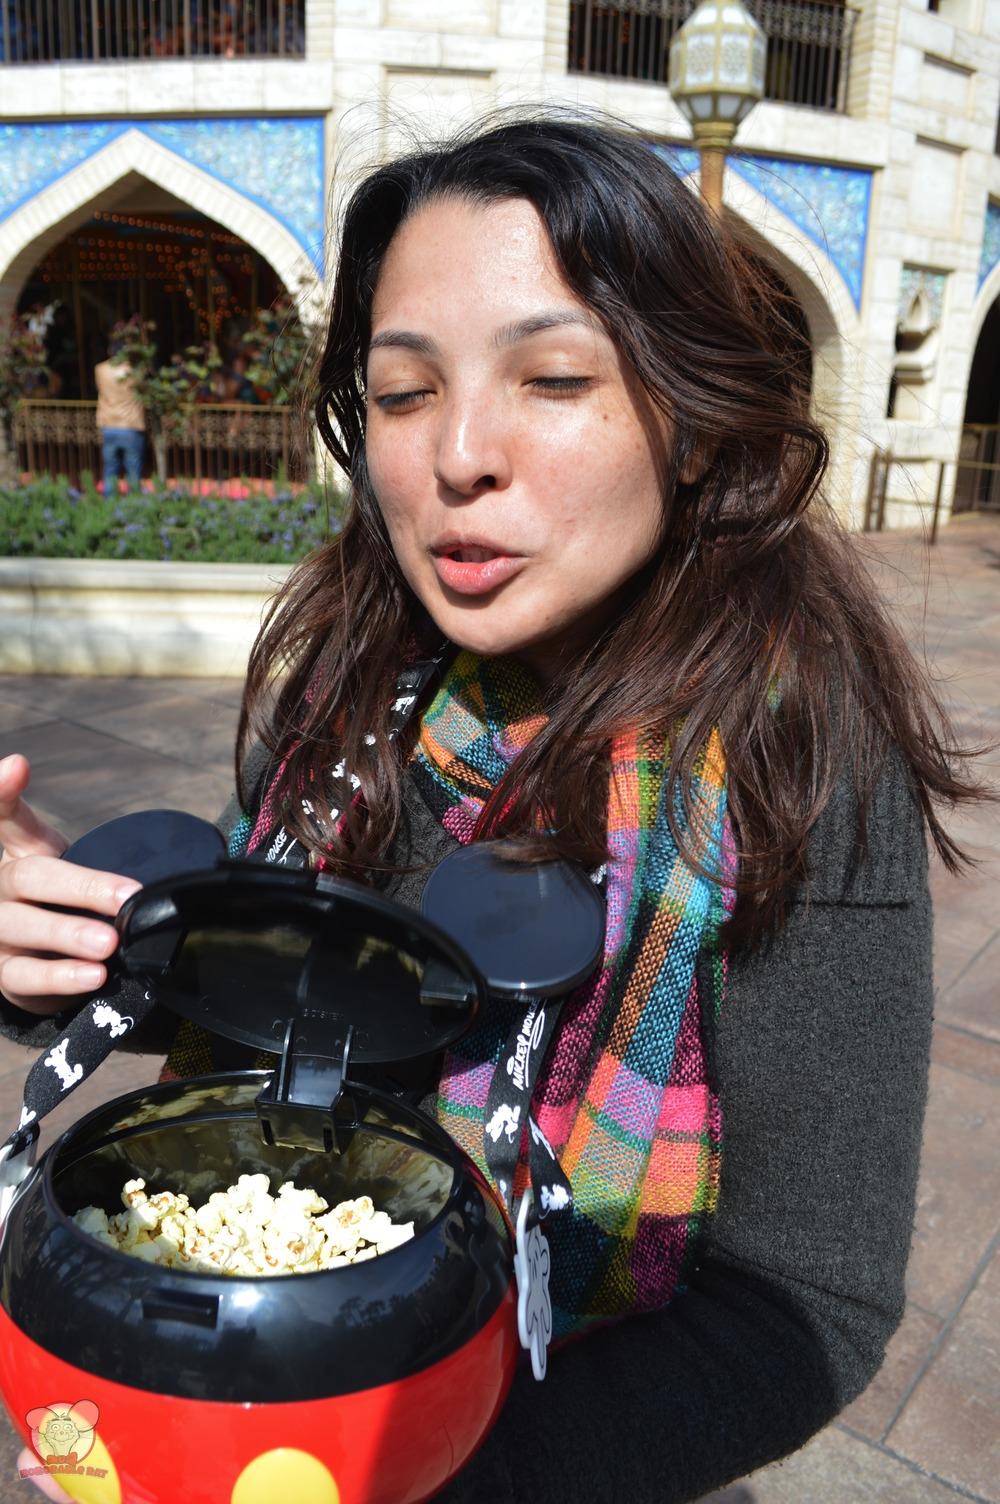 Nadia, The Curry Popcorn Lady